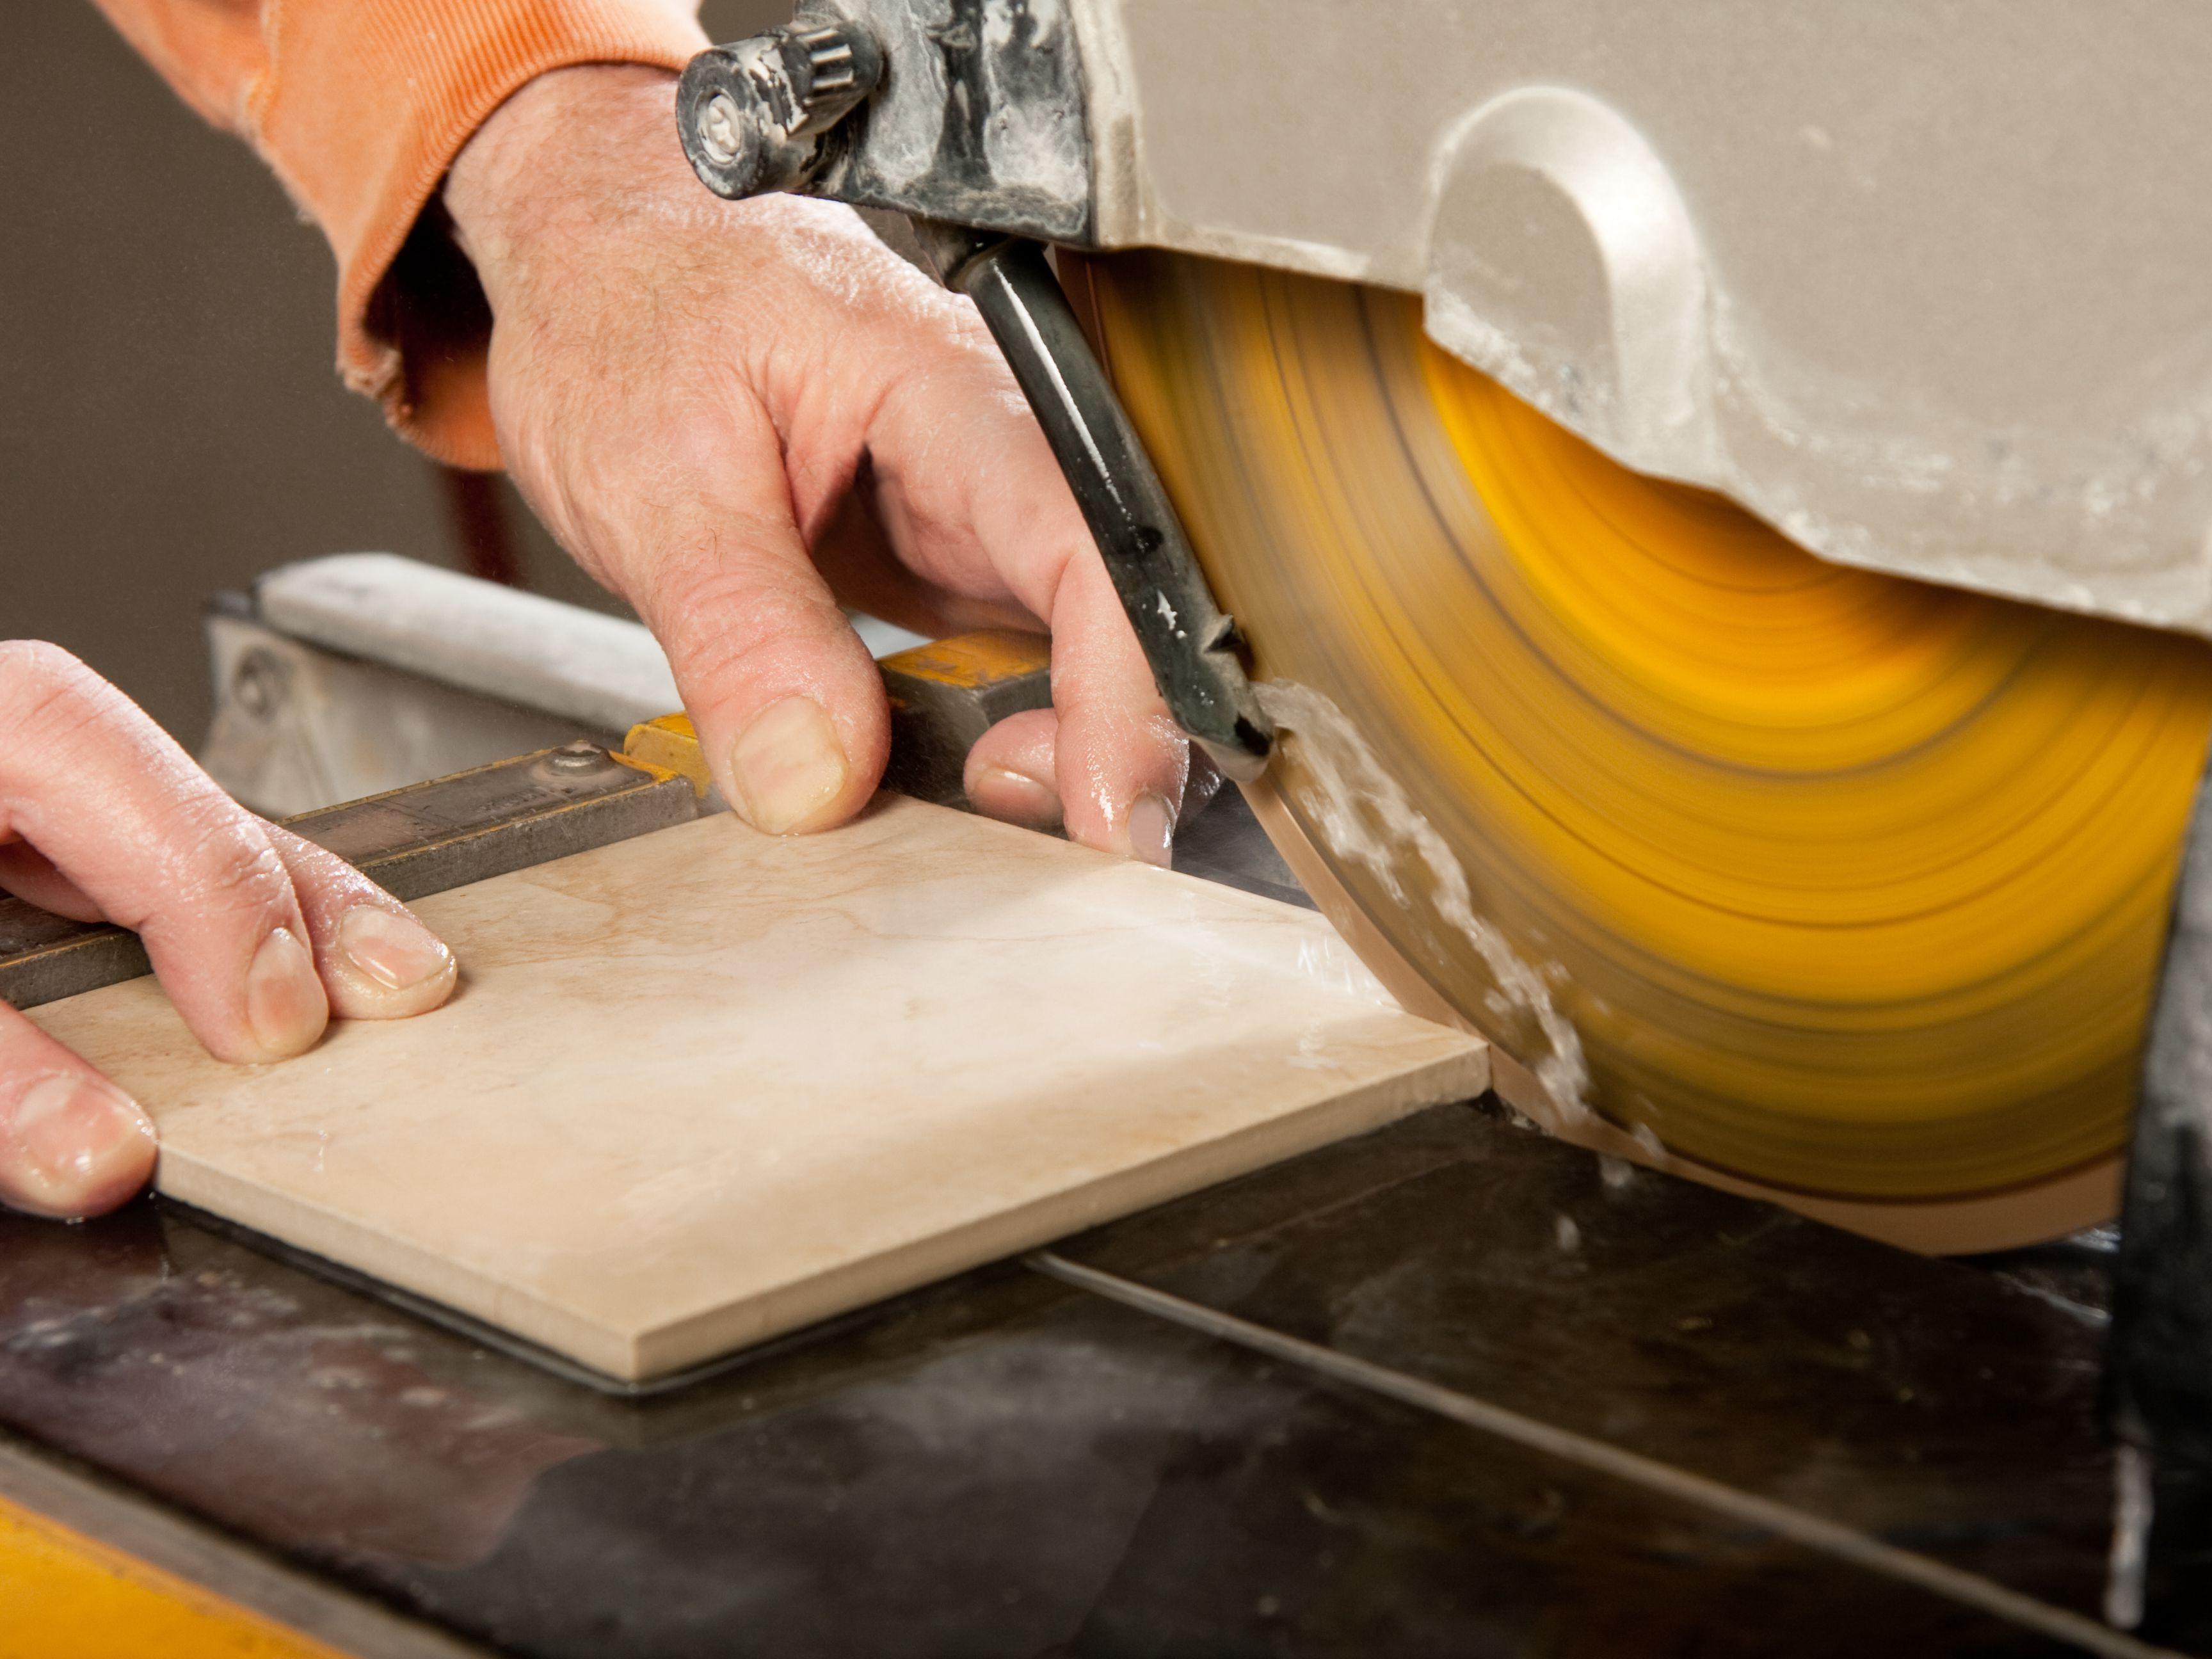 tile saw rental vs purchase guide